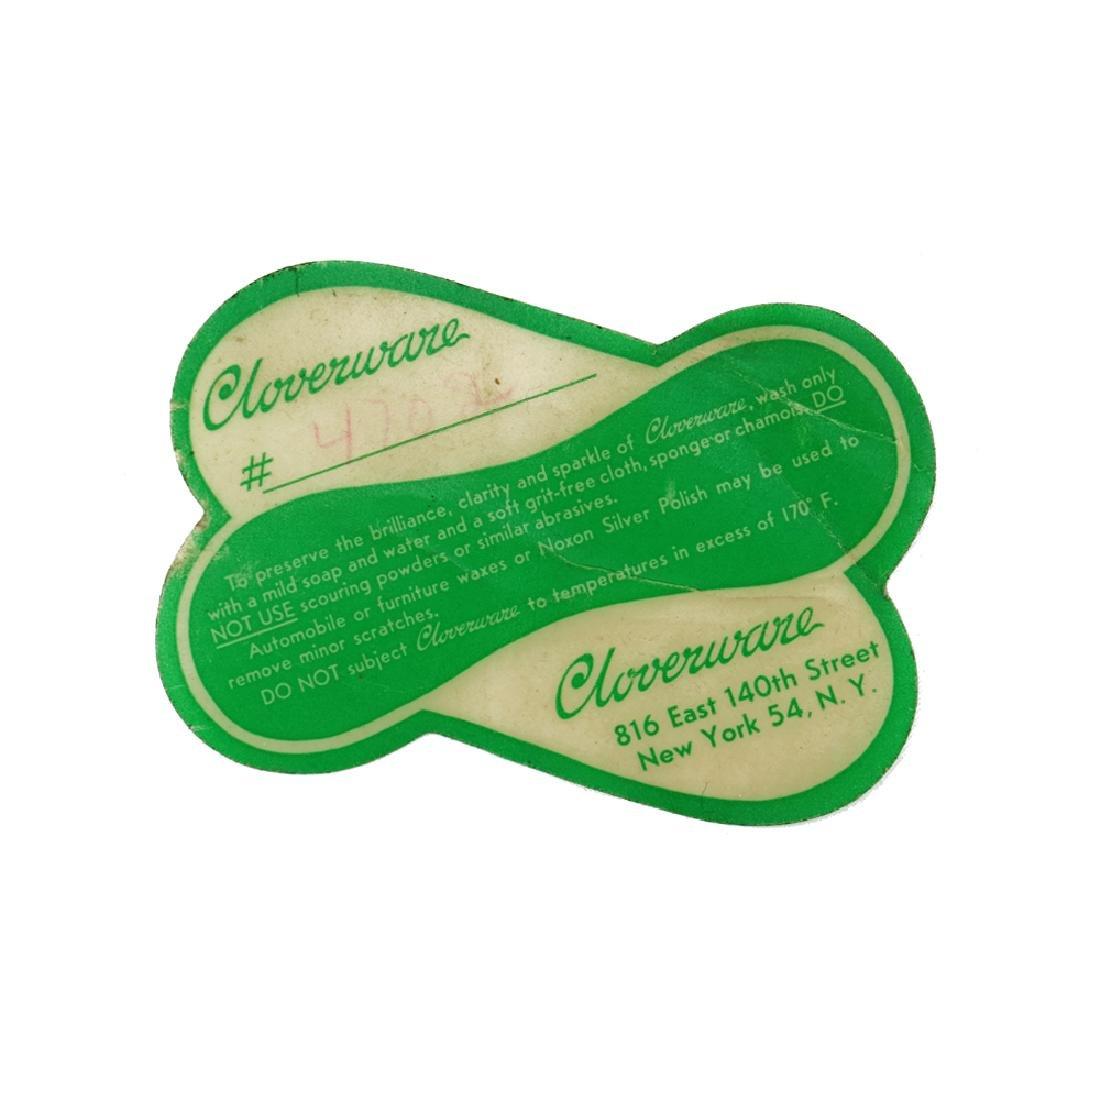 A Rare Cloverware Trade Label